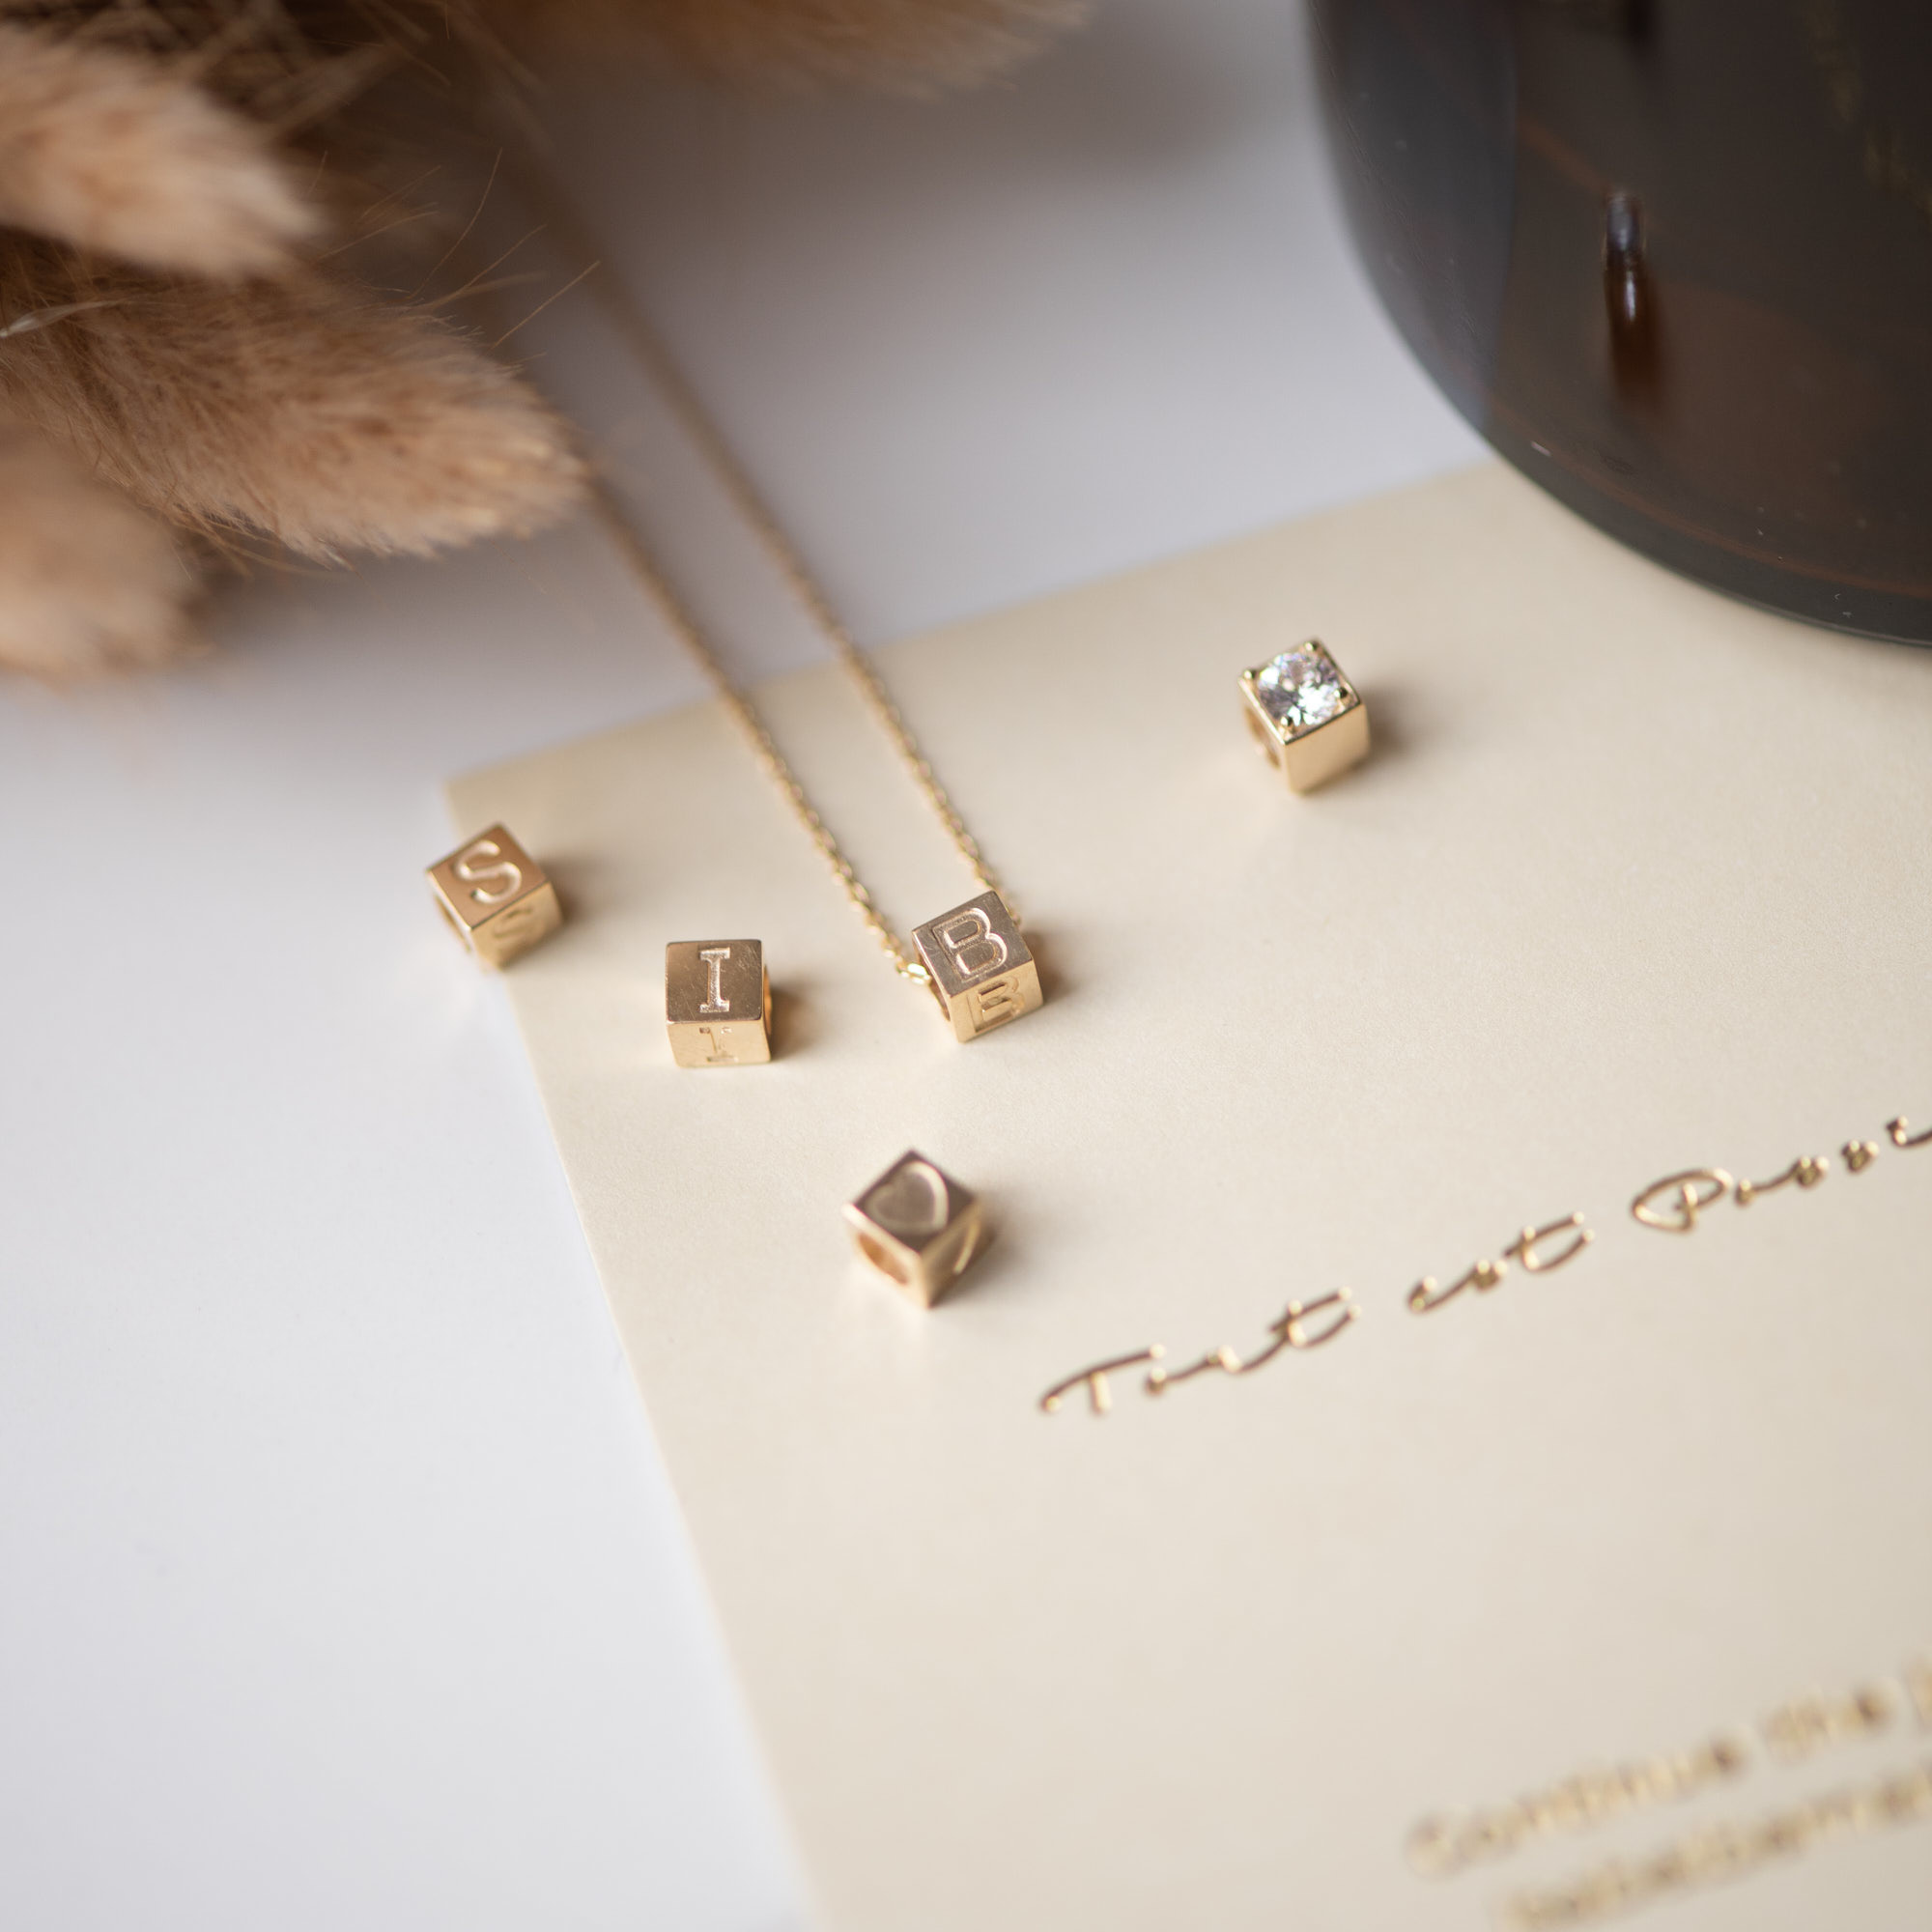 Isabel Bernard Ciondolo cubo Le Carré Felie in oro 14 carati con cuore